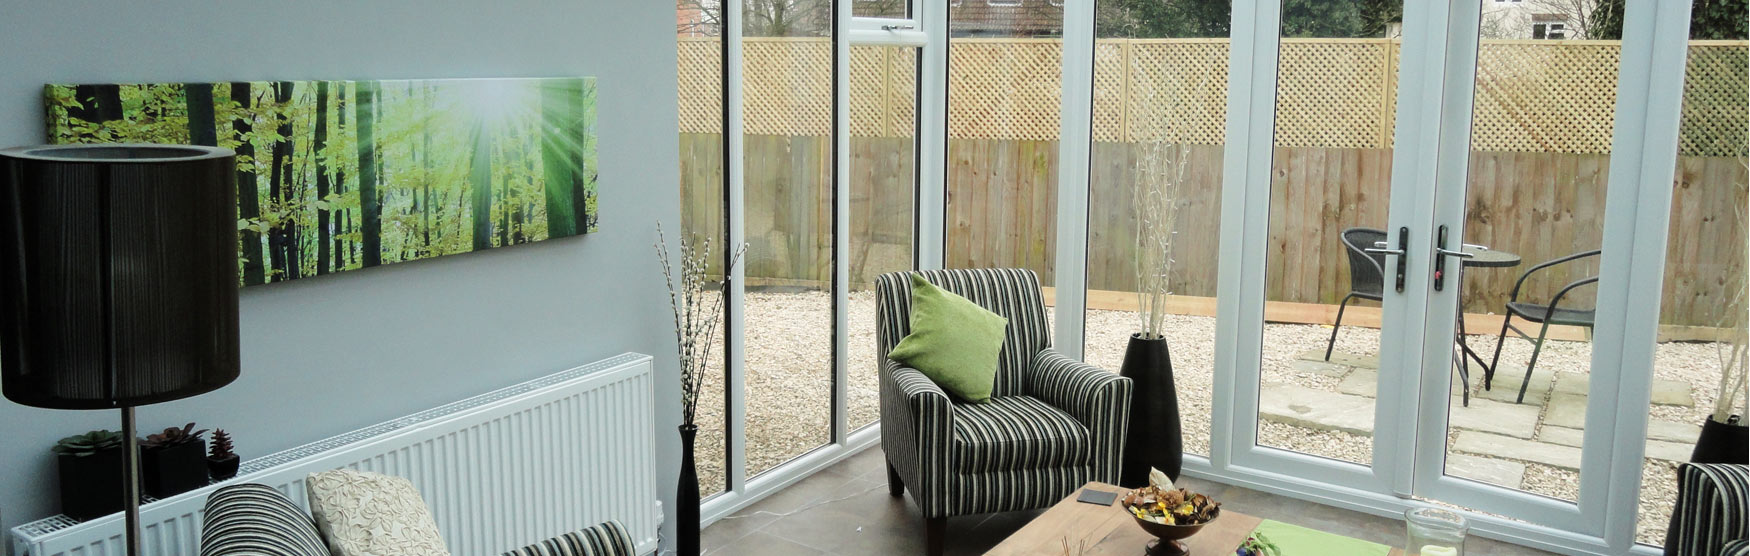 slider-conservatory-0061